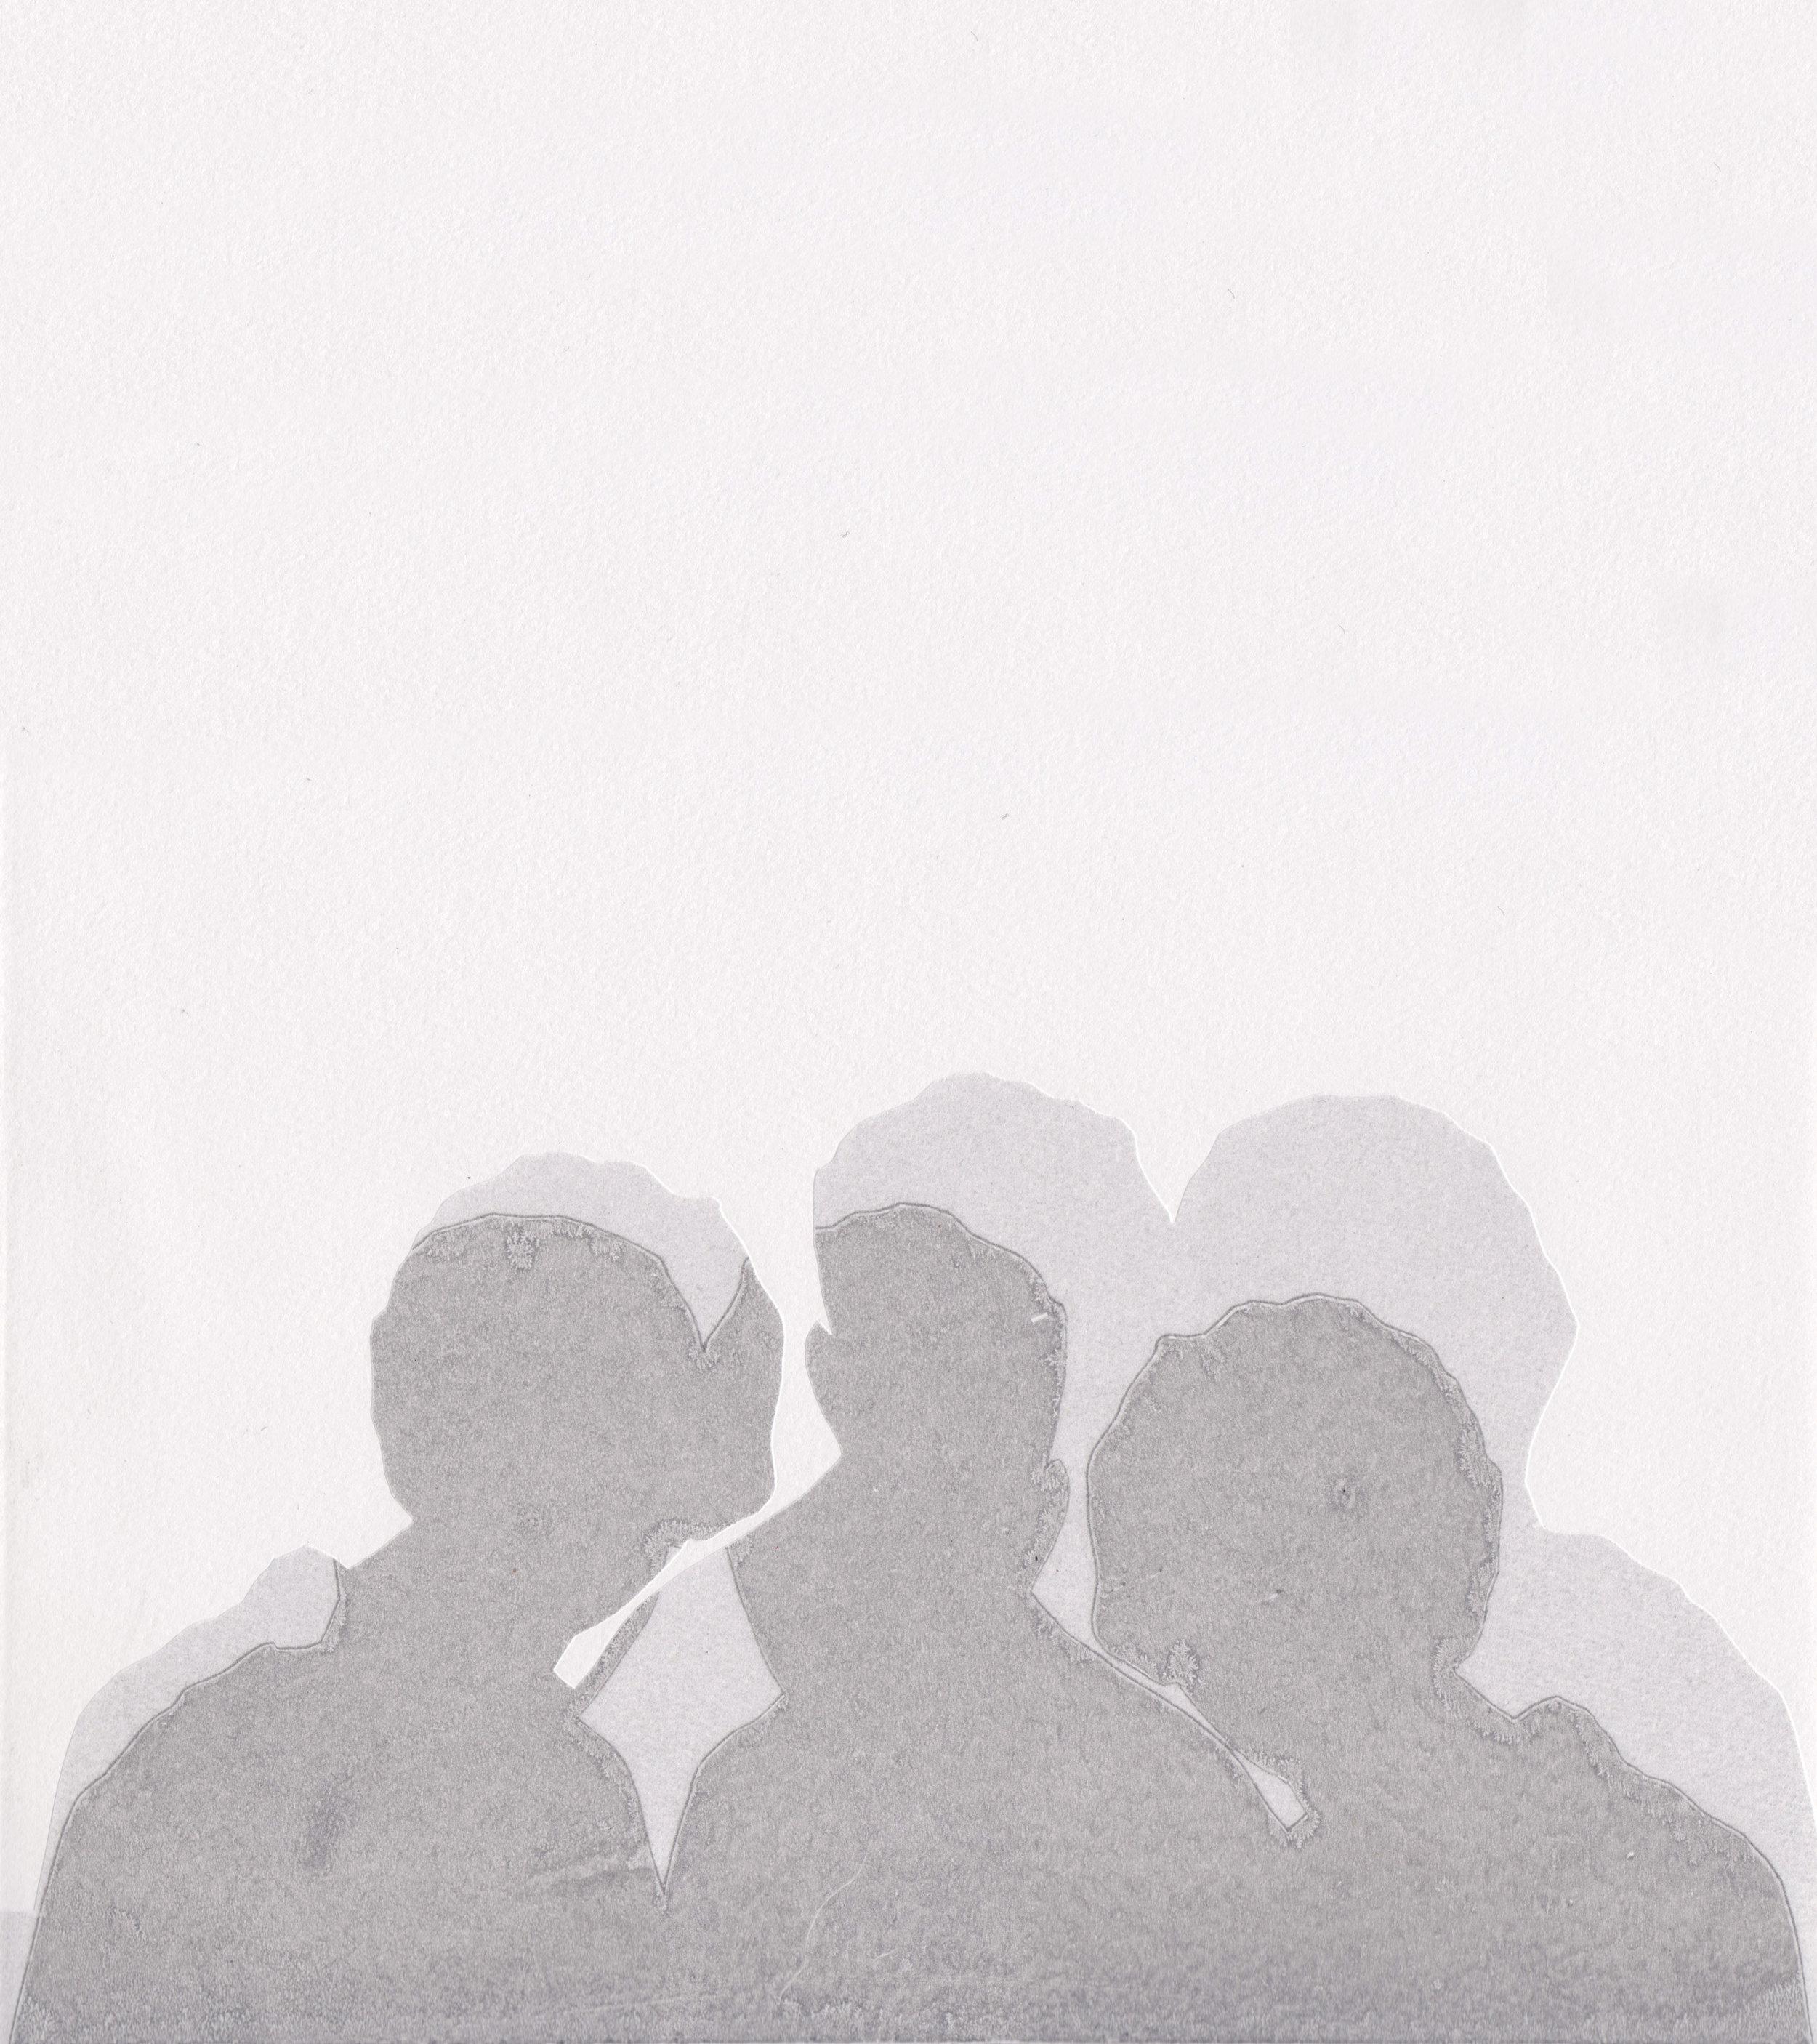 Silhouettes II